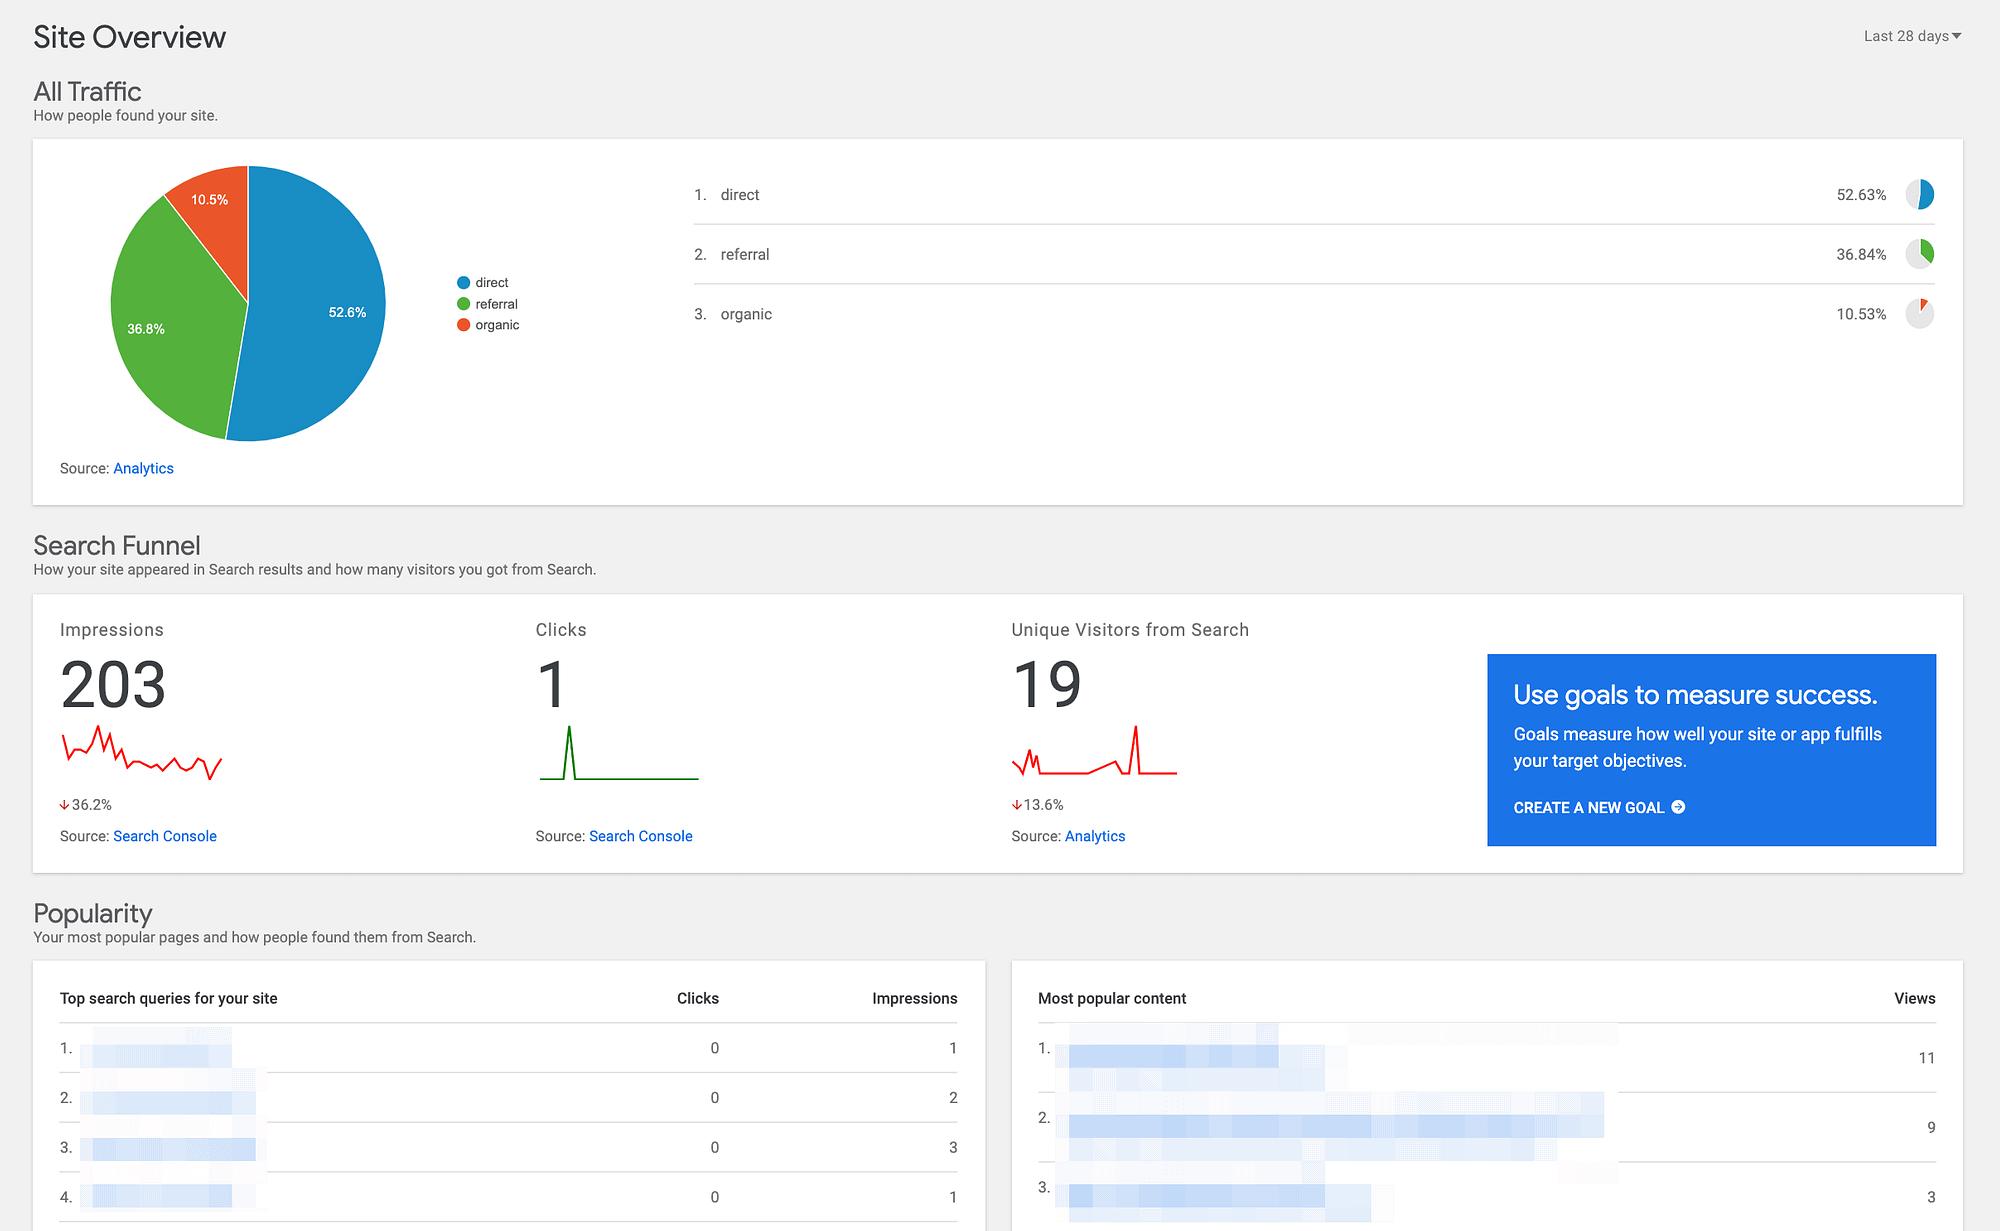 Rezultati usluge Google Analytics i Search Console.